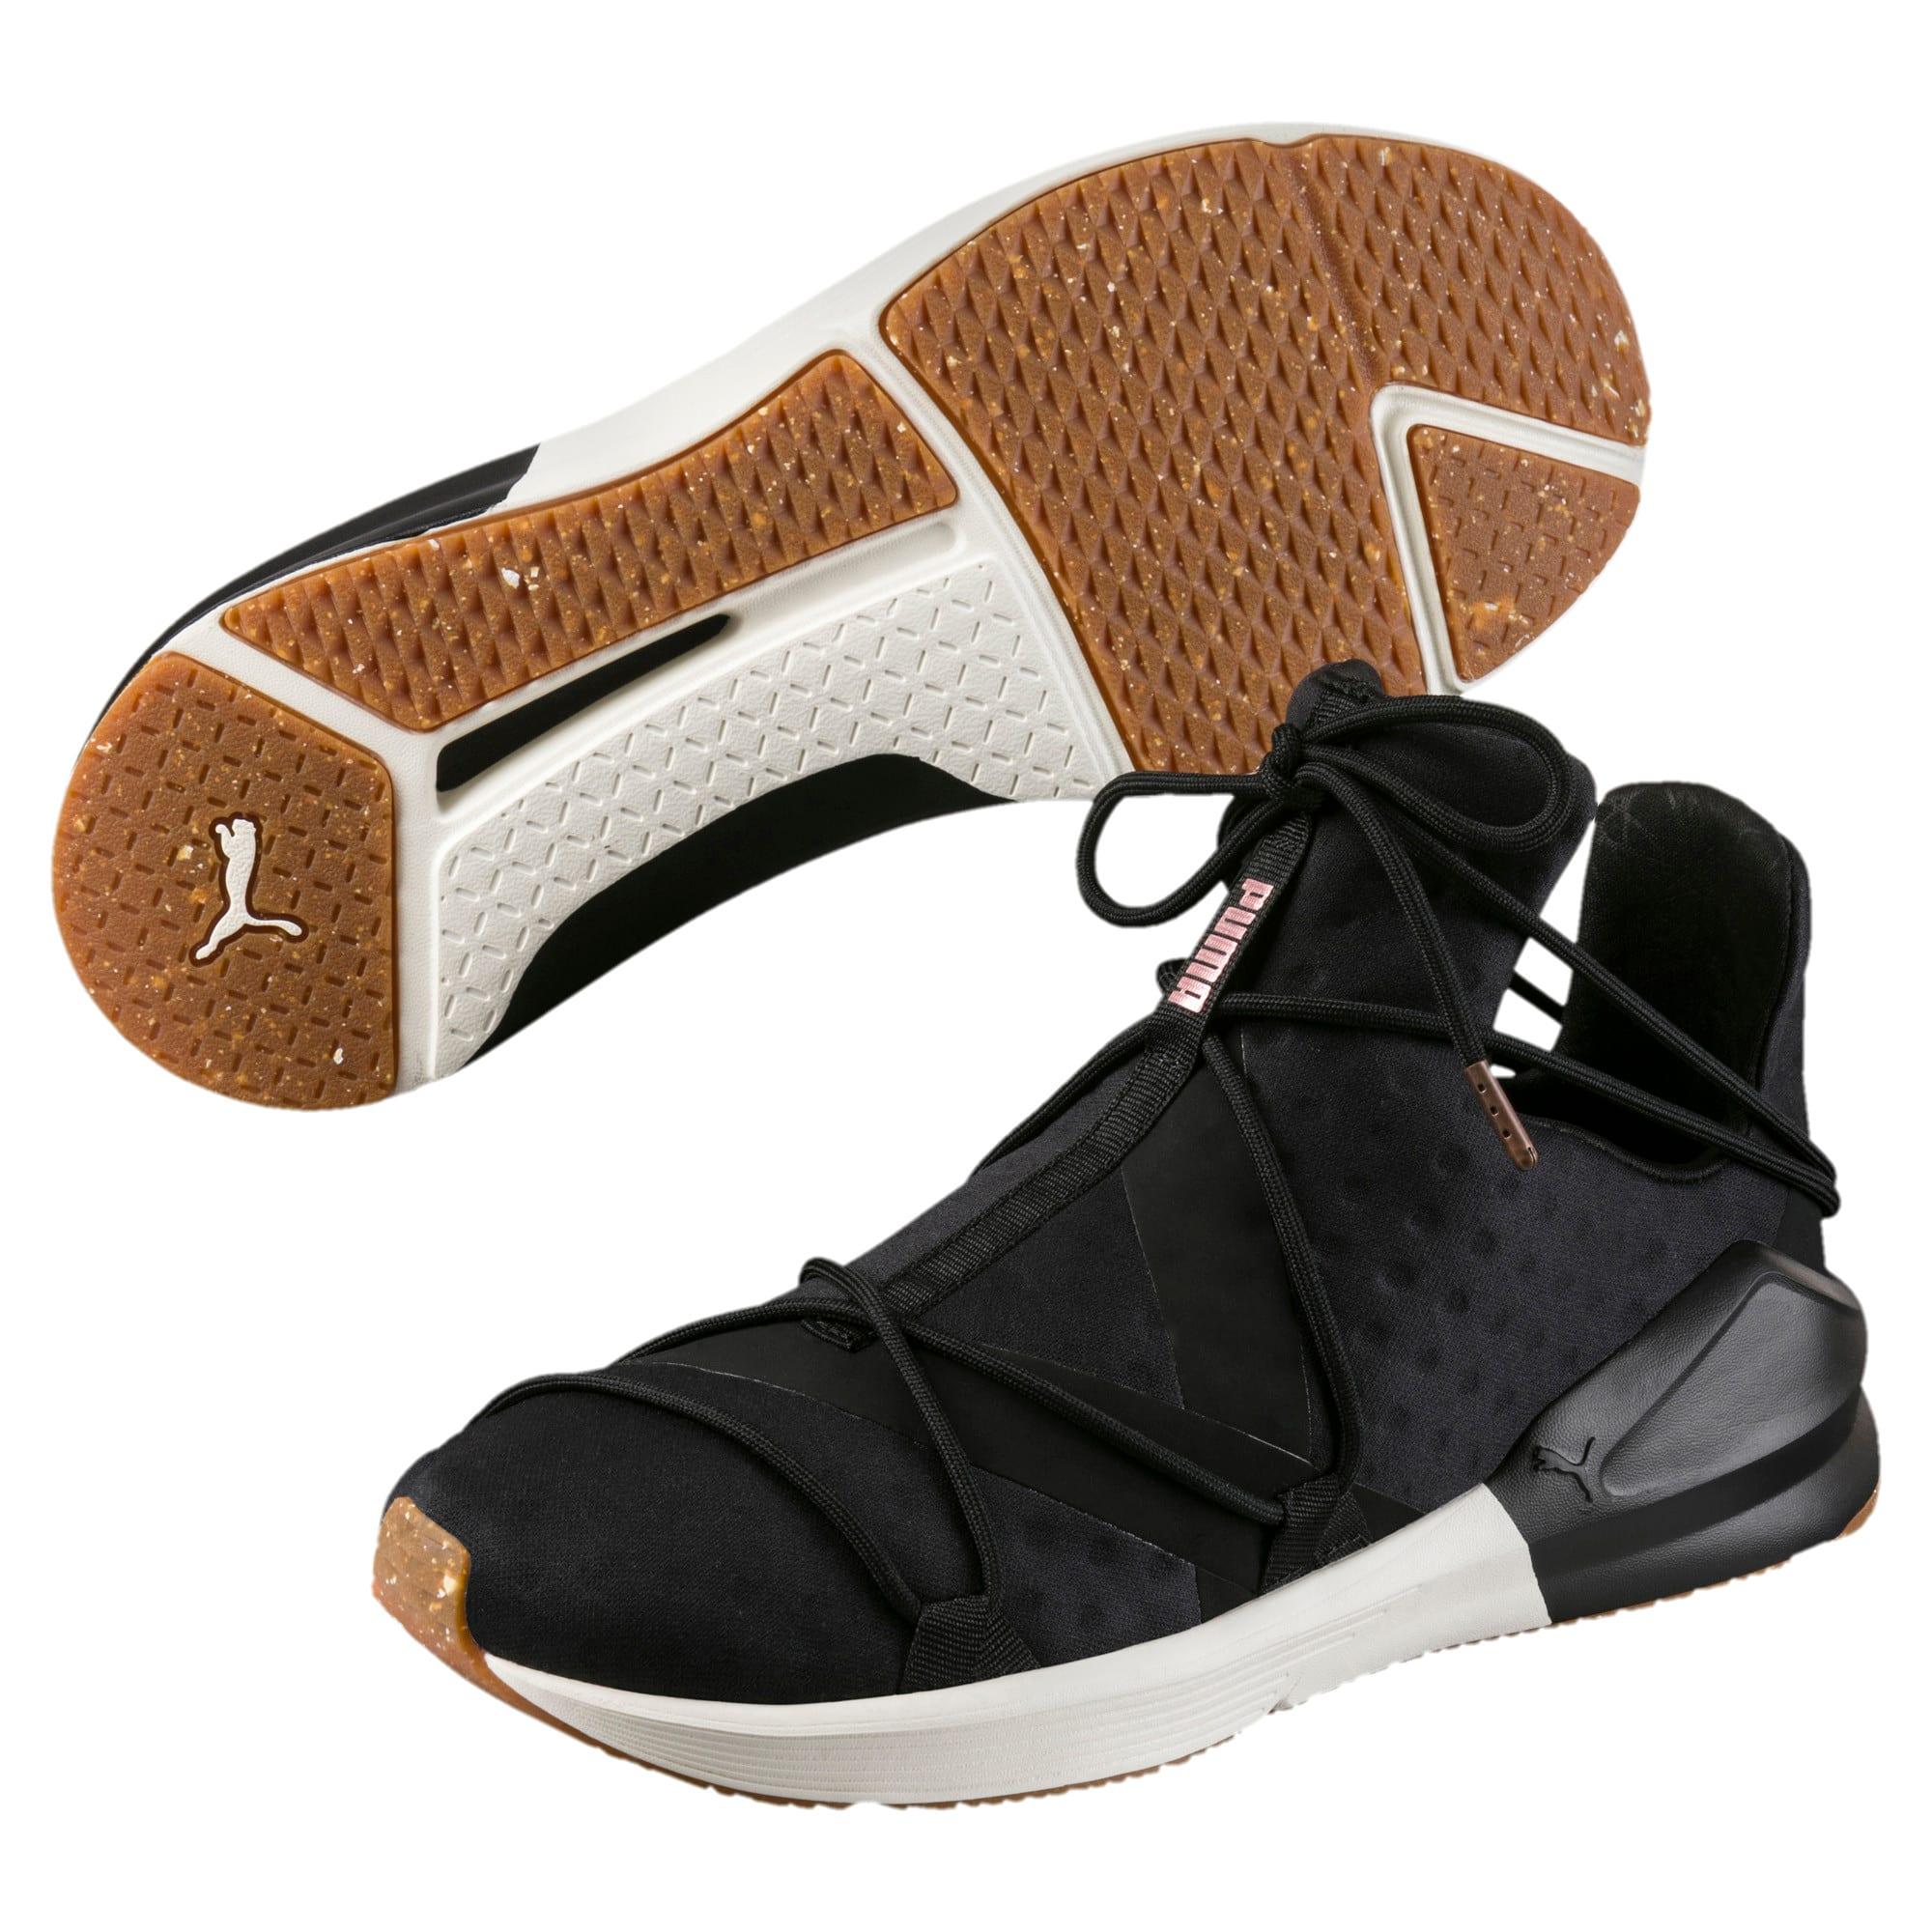 Thumbnail 2 of Fierce Rope VR Women's Training Shoes, Puma Black-Whisper White, medium-IND